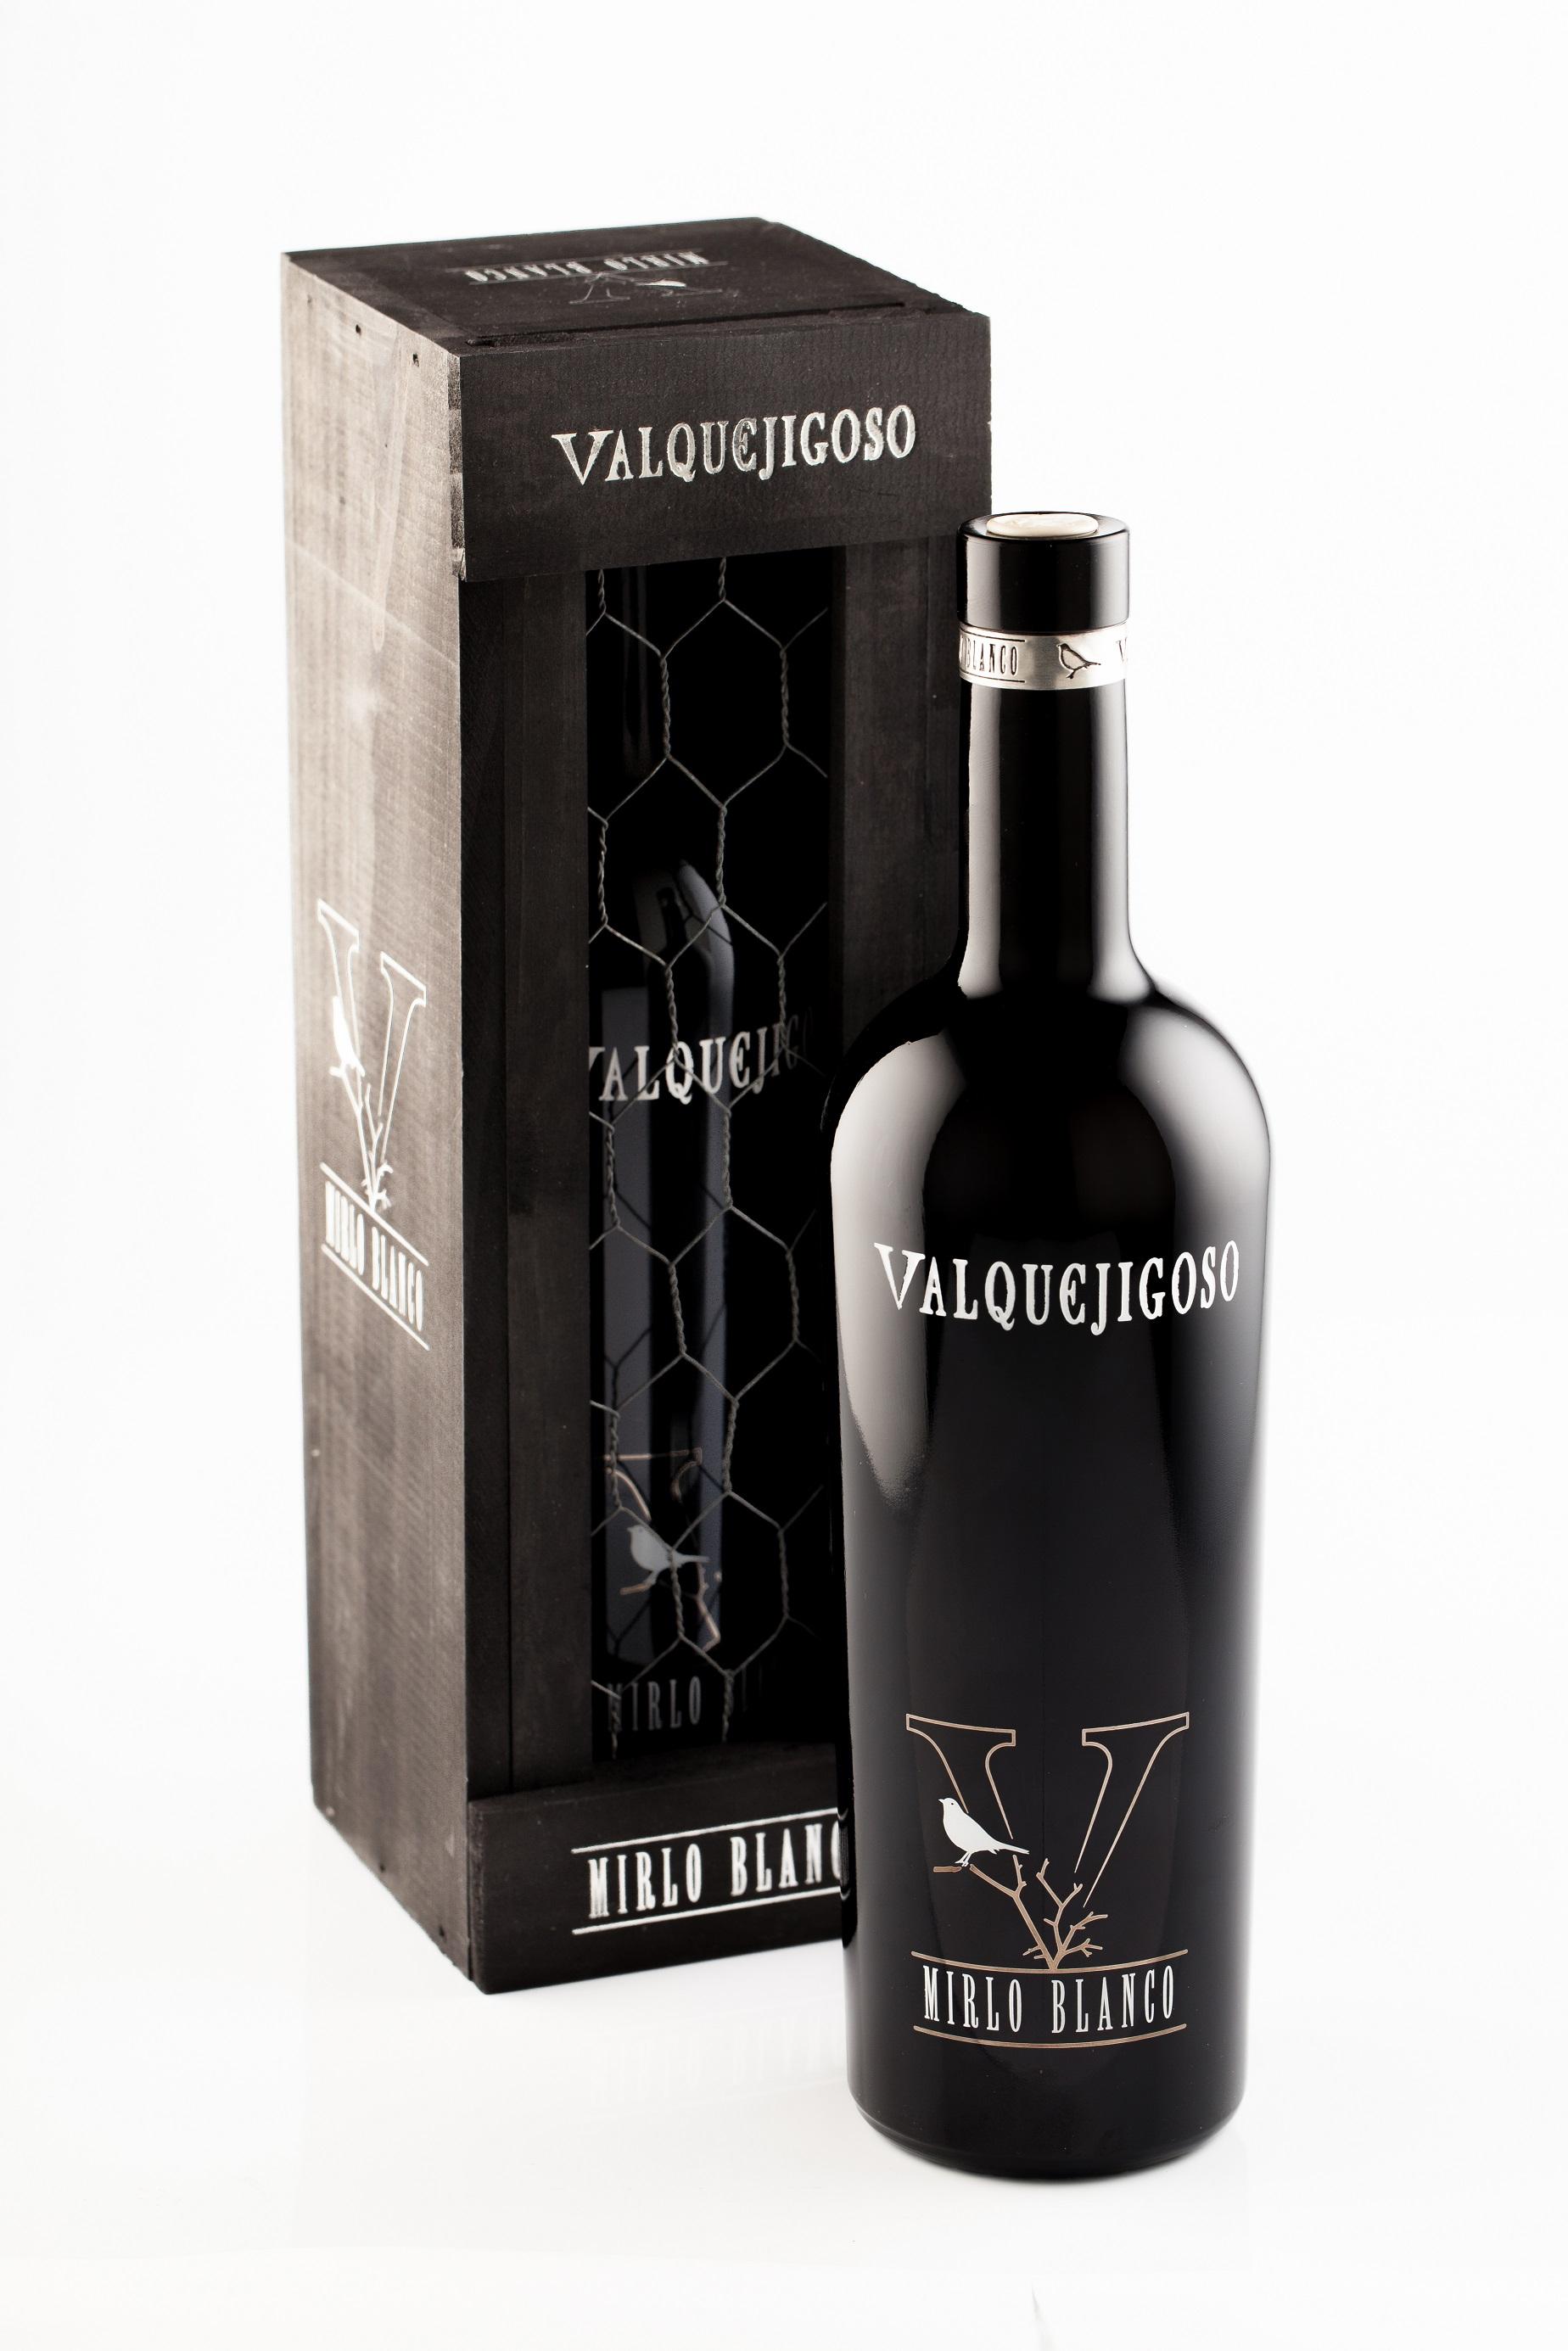 Mirlo Blanco 2015, un vino blanco redondo de Madrid